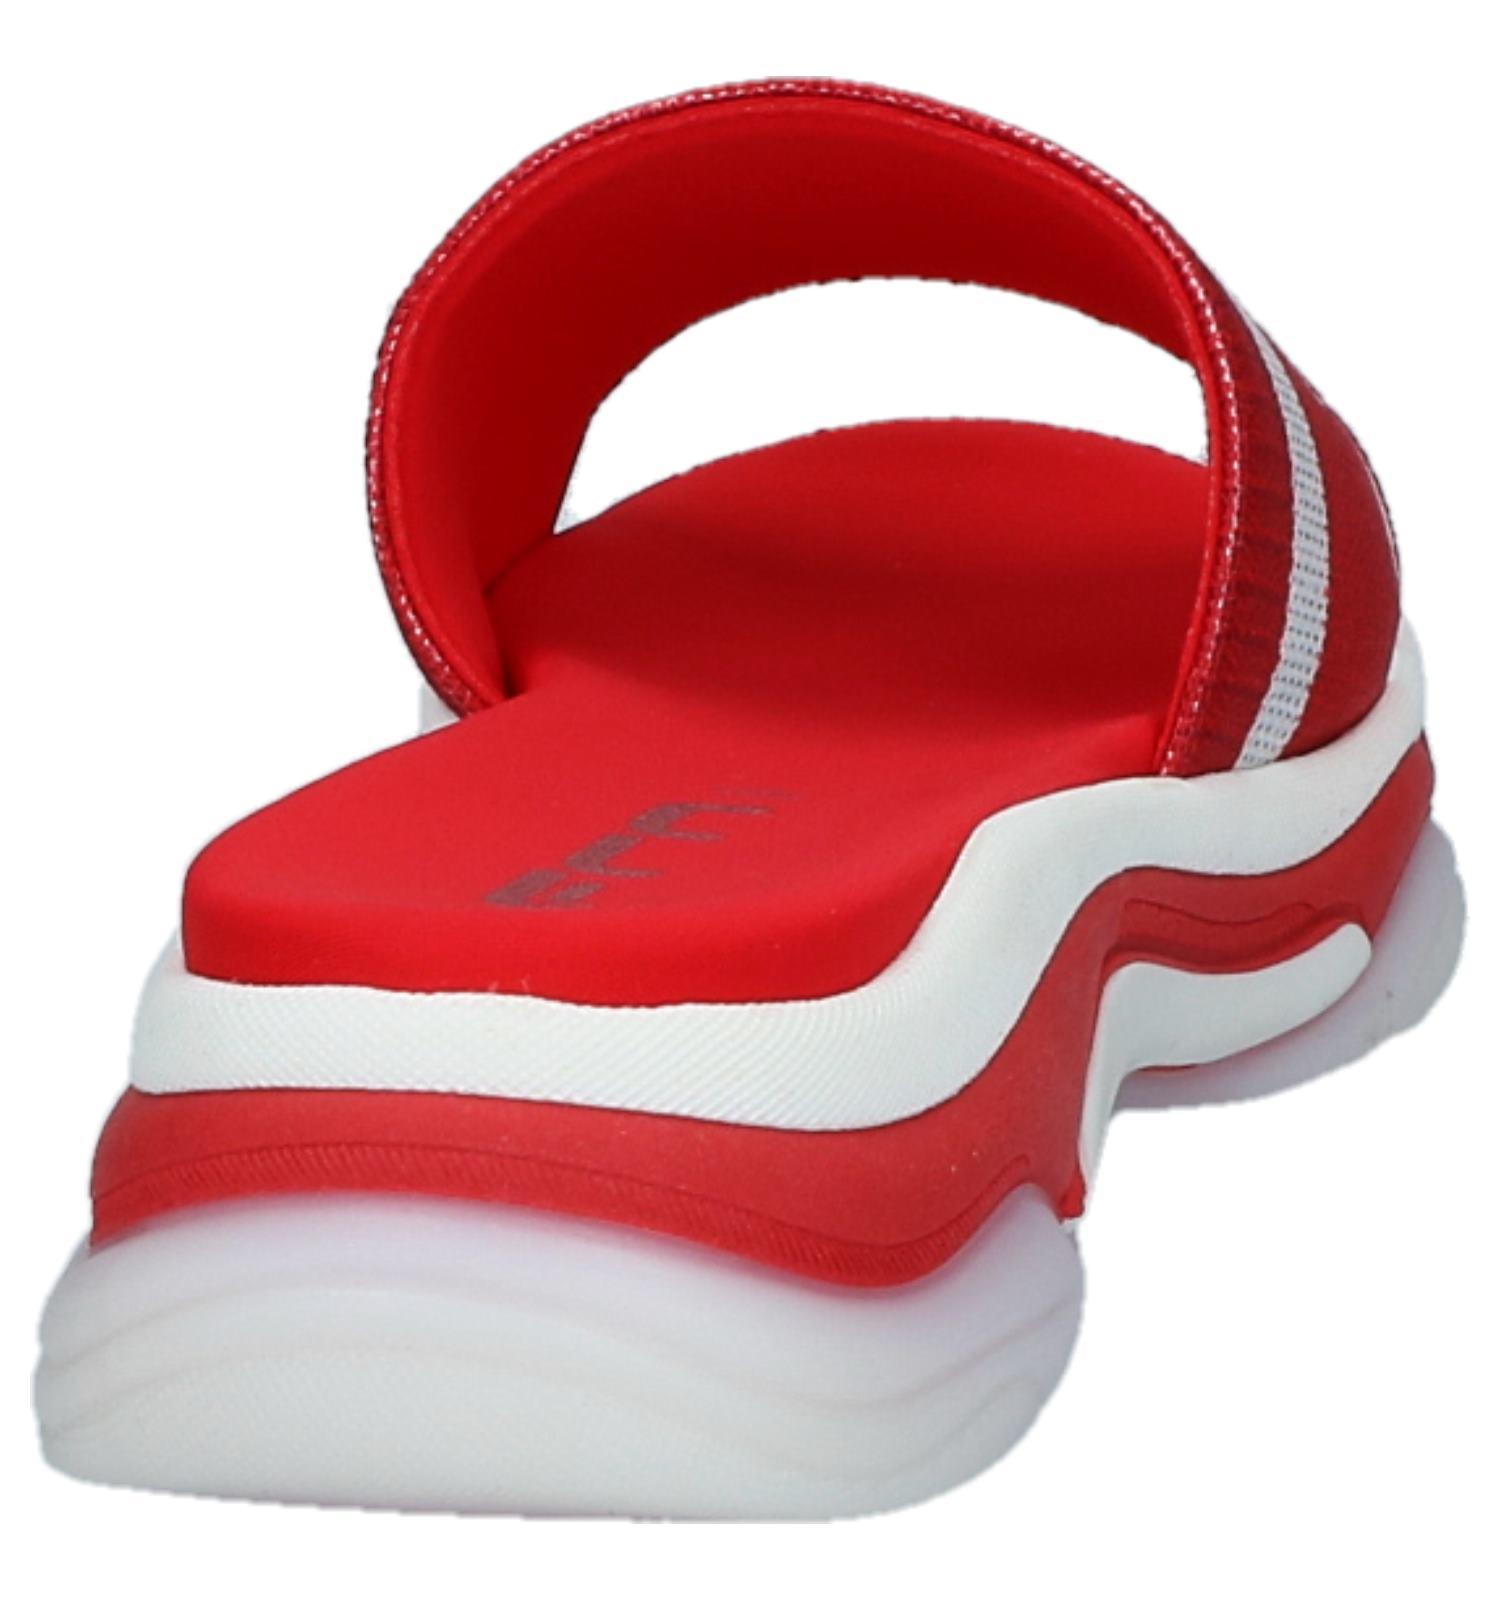 Rode Fornarina 10 10 Rode Slippers Super Super Fornarina PXiuOZk